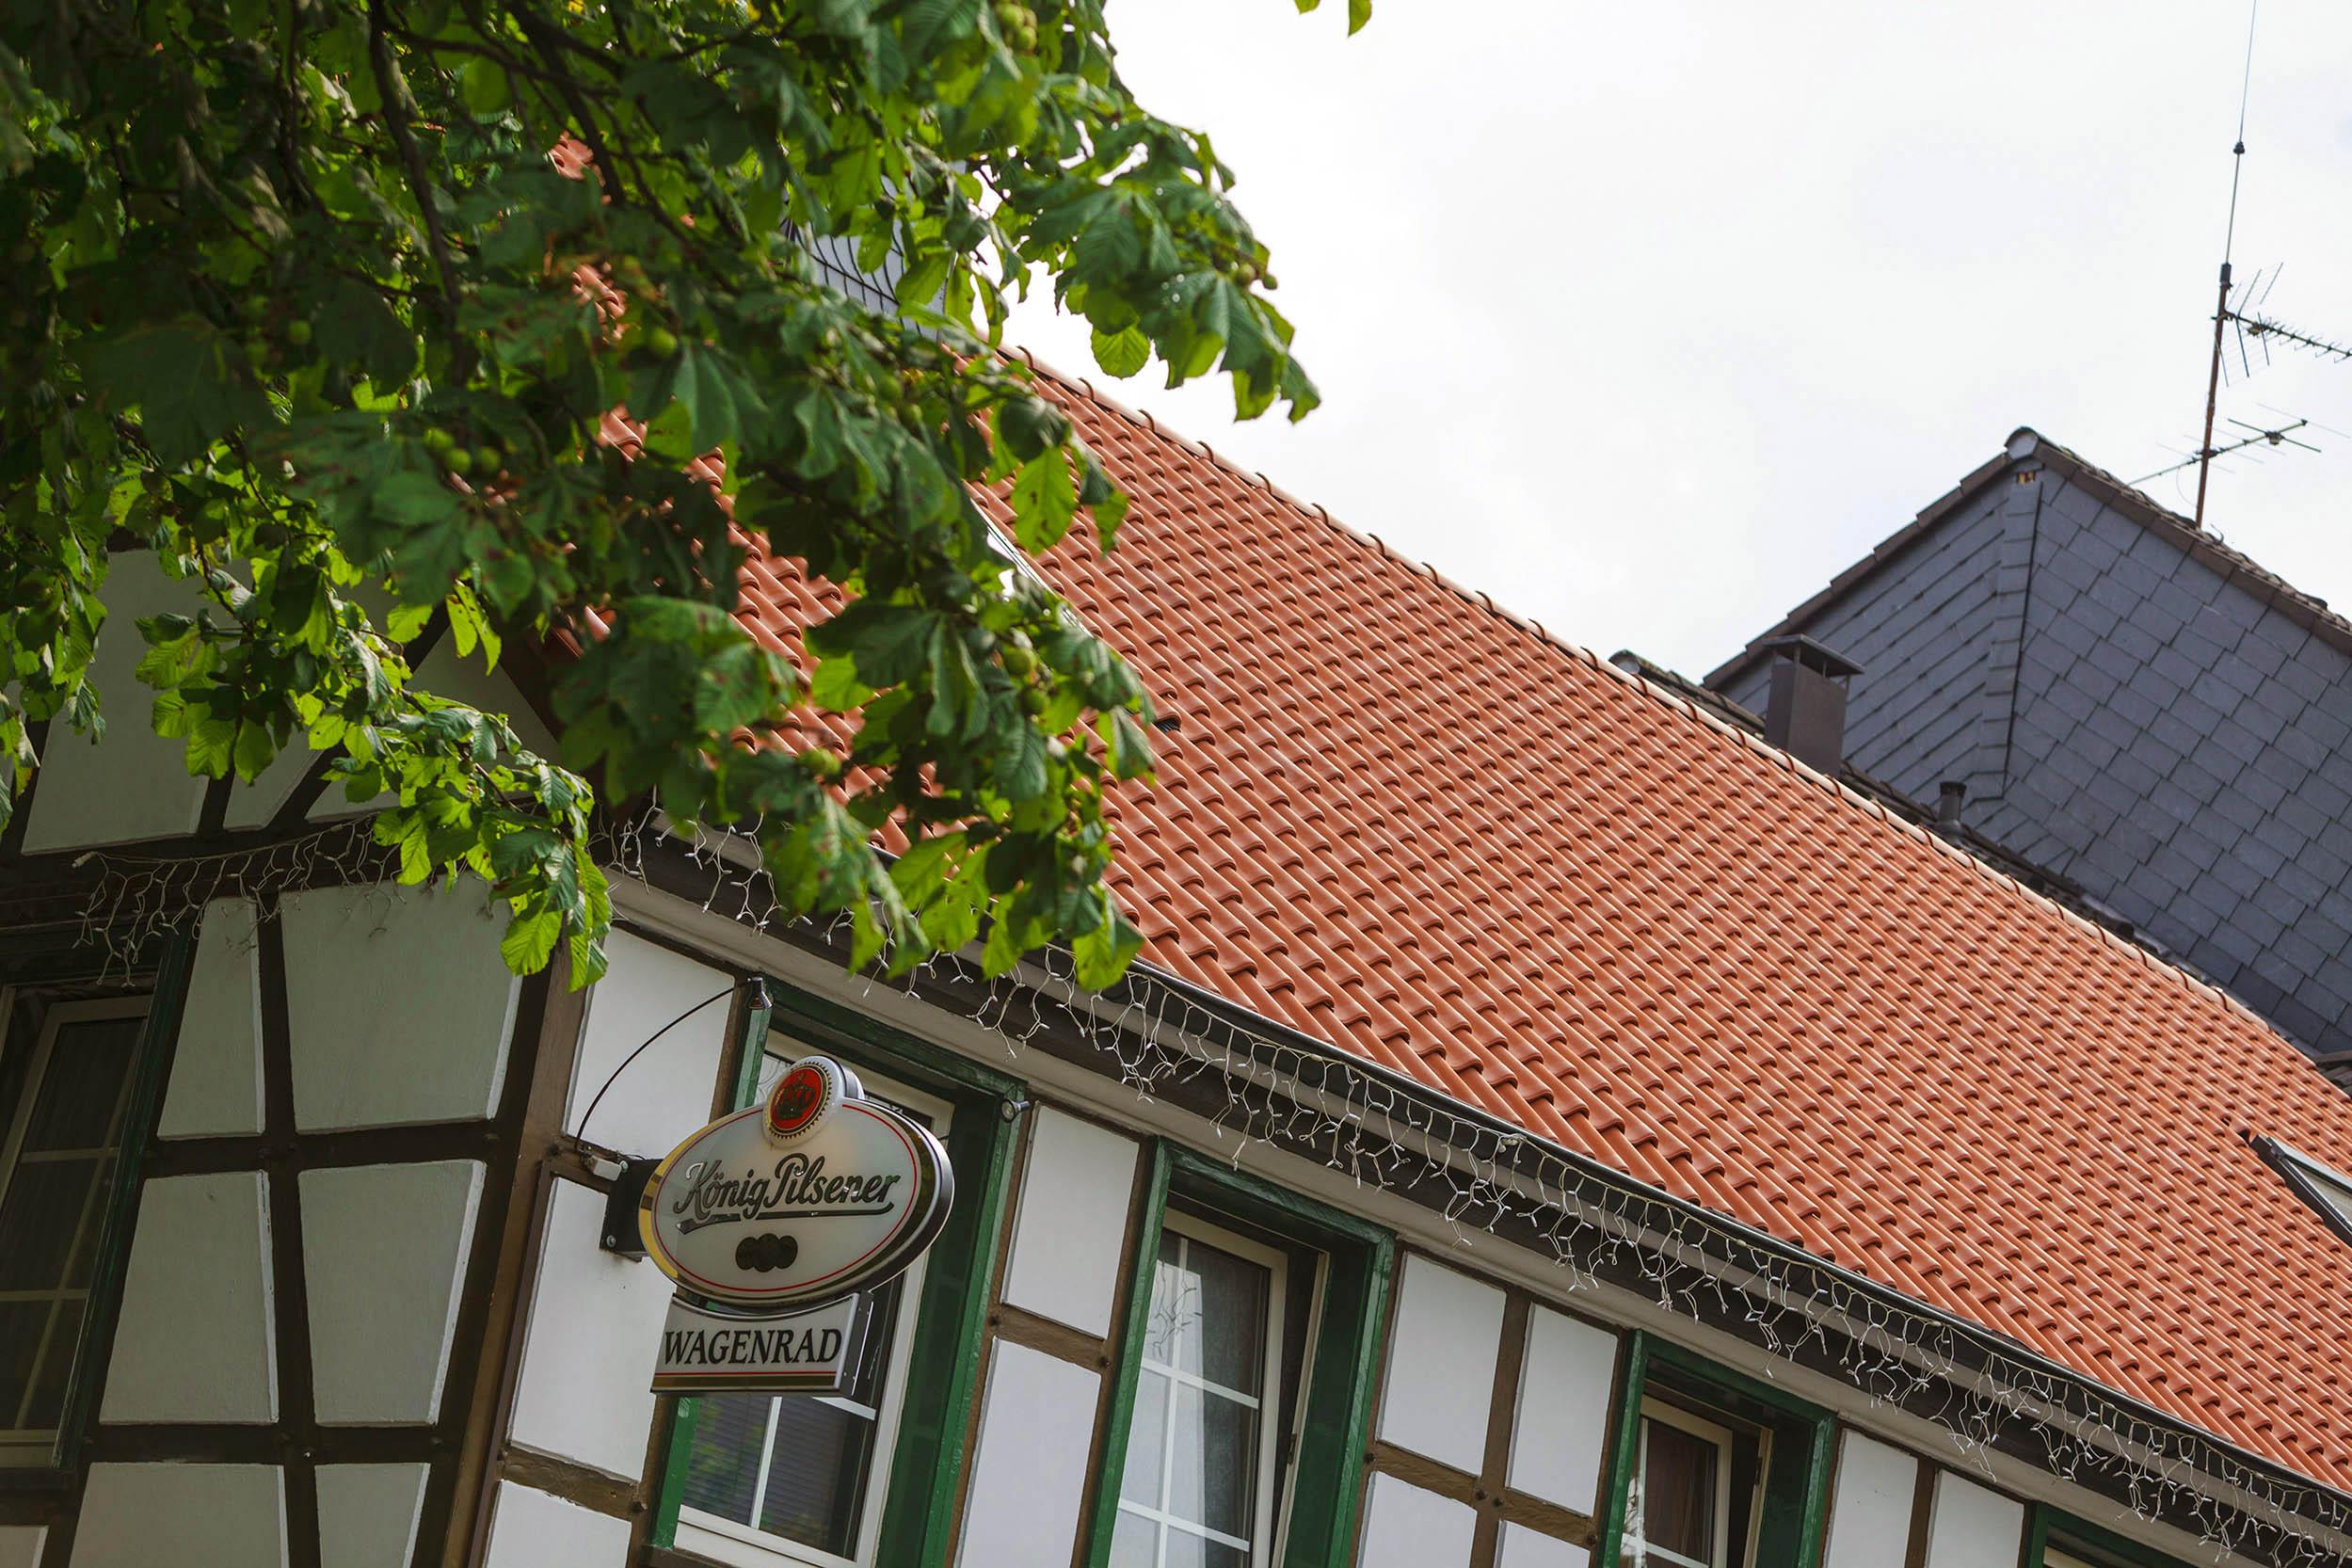 gasthaus-plettenberg-image-2